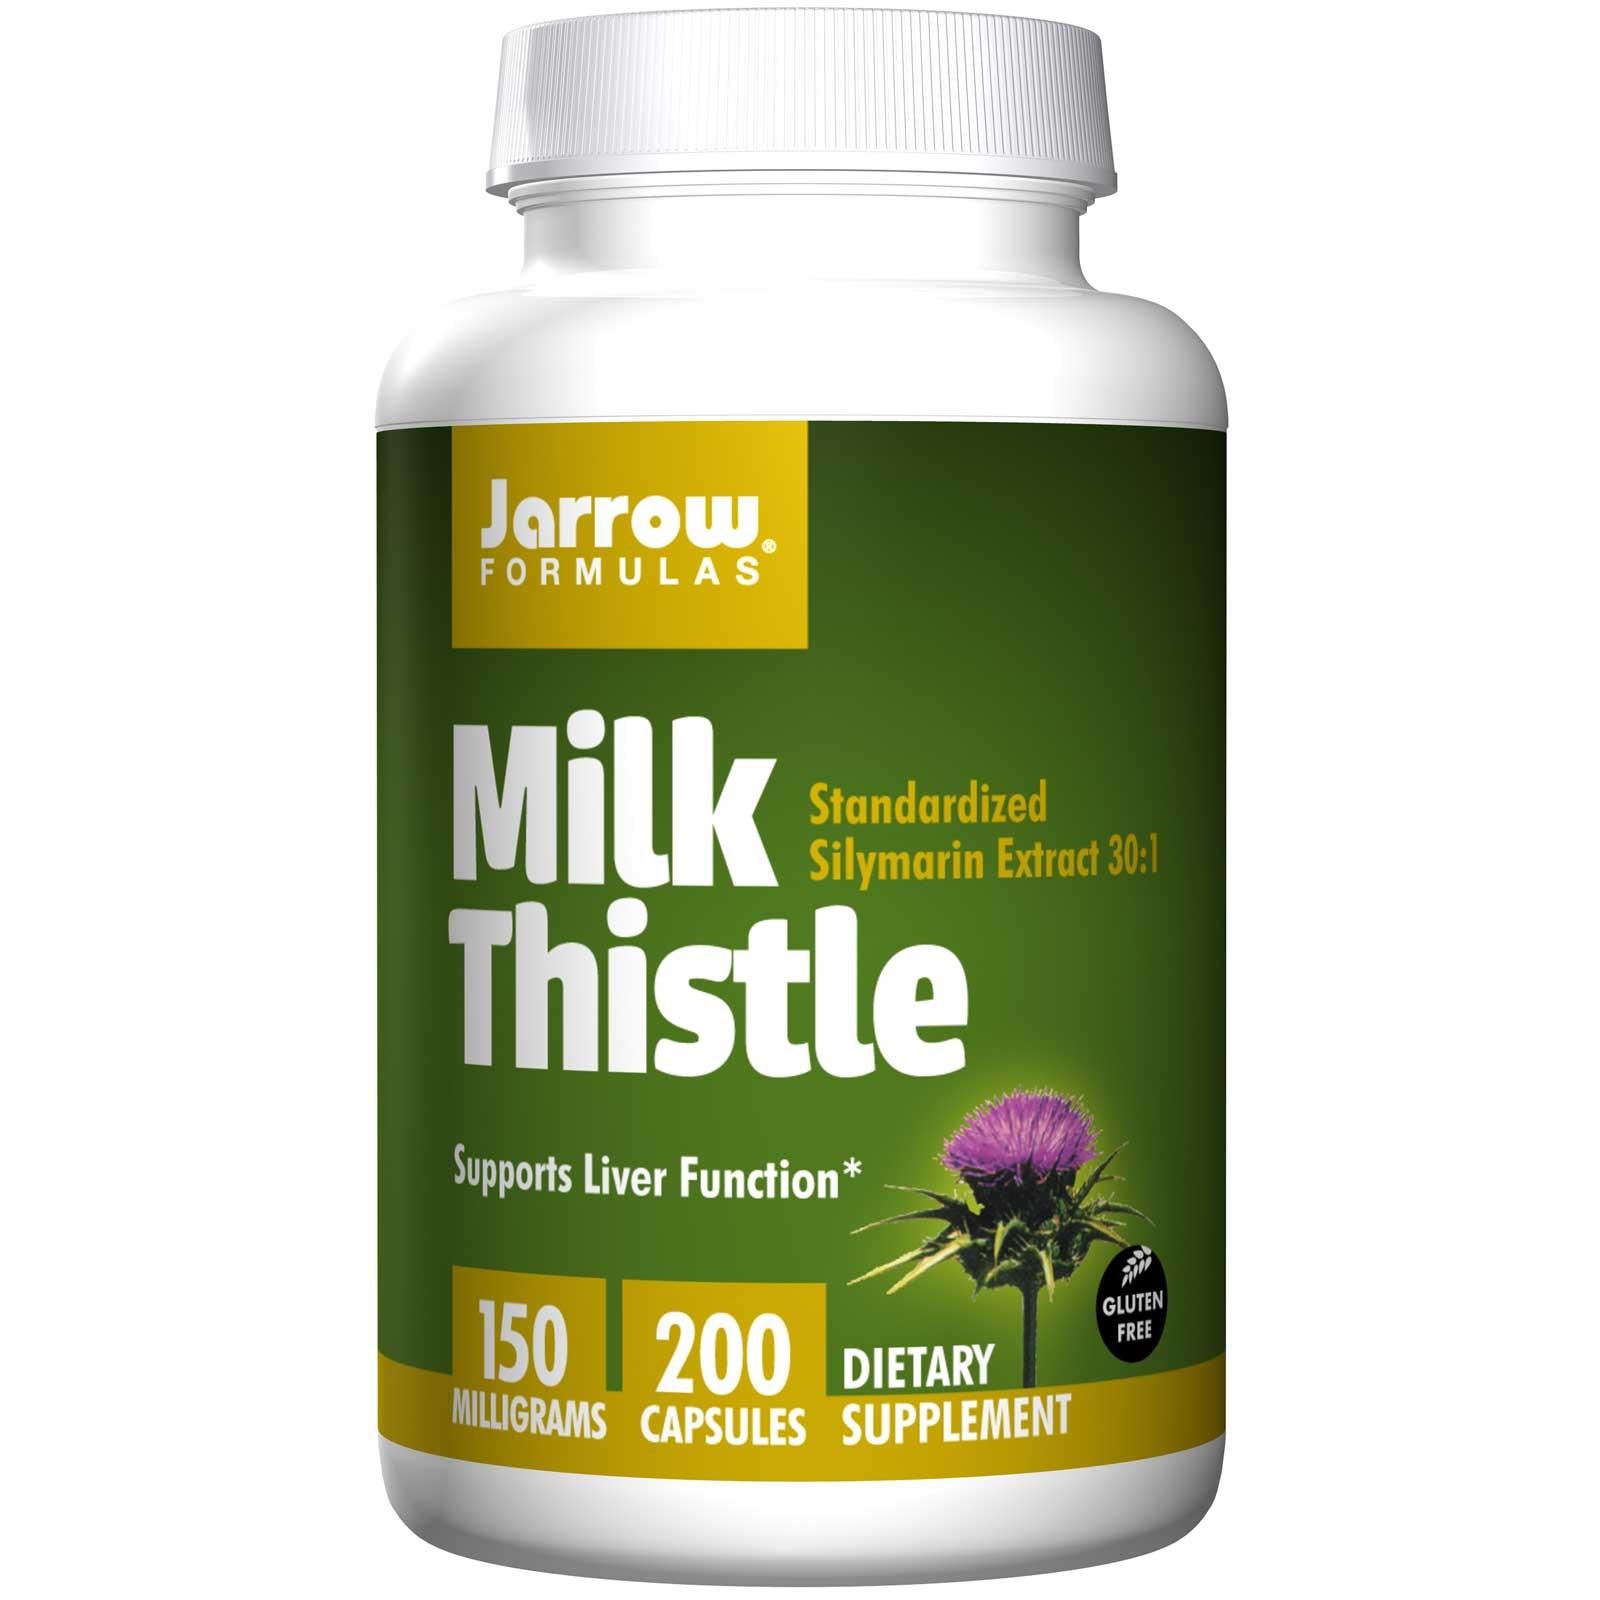 Jarrow Formulas Milk Thistle 150 mg 200 Capsules